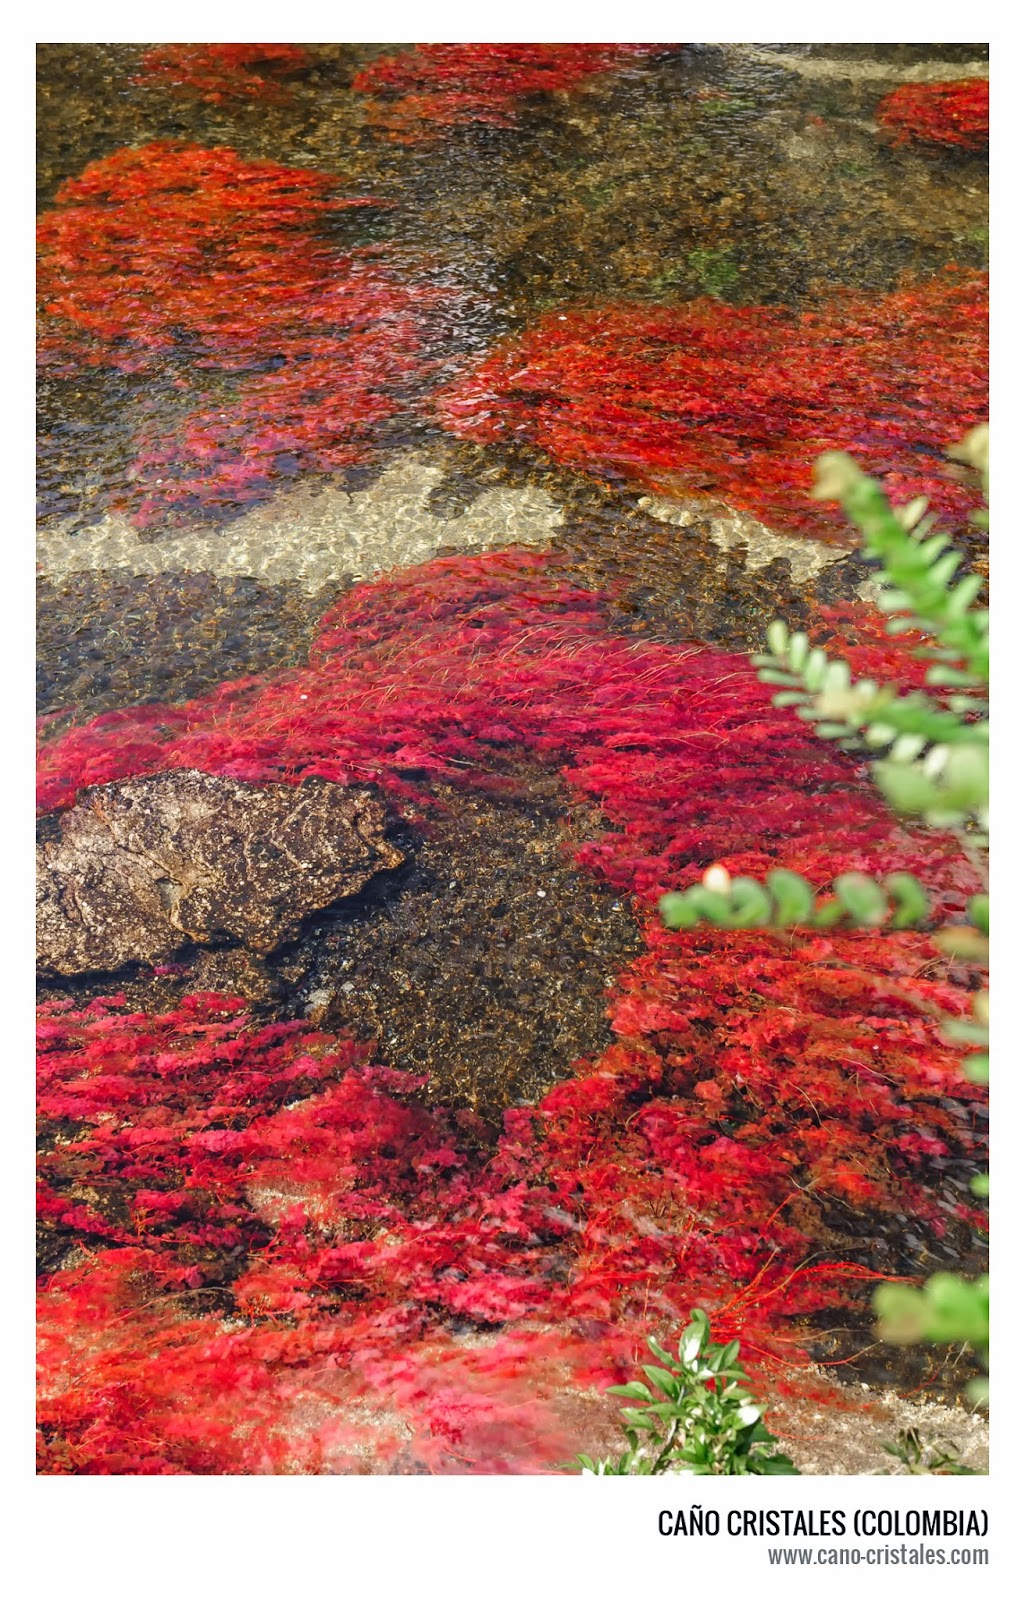 Macarenia clavigera, planta endémica en Caño Cristales